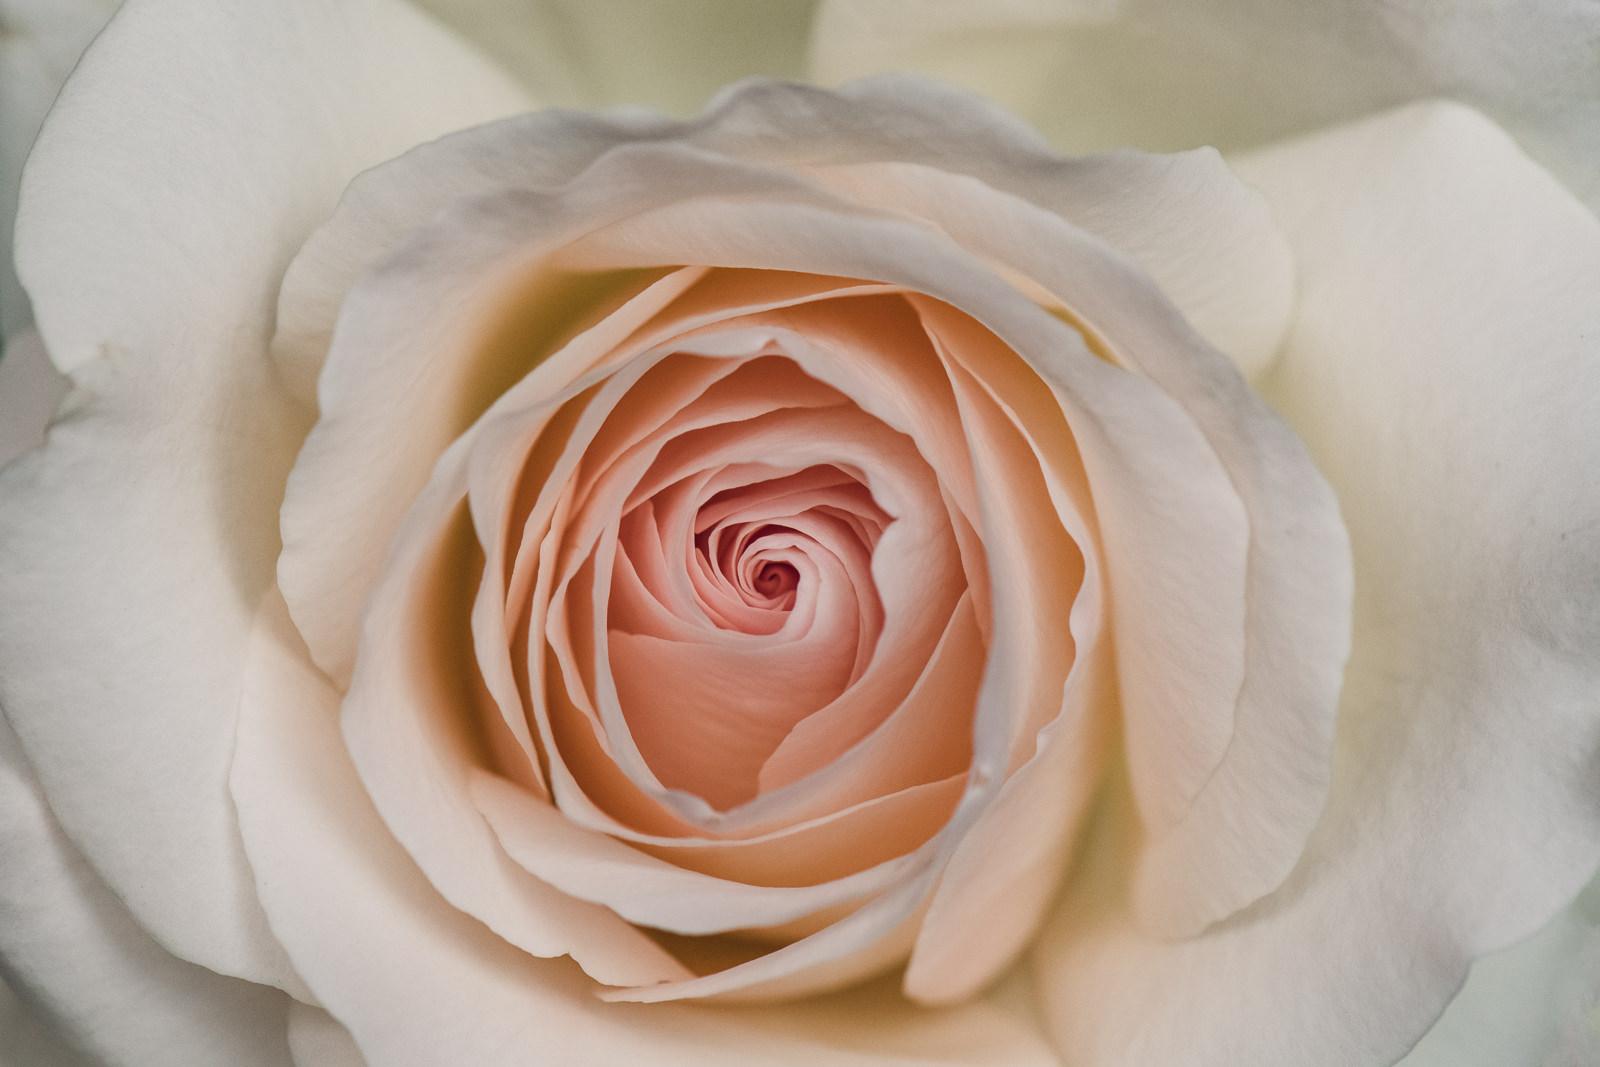 up close detail of a pale peach rose